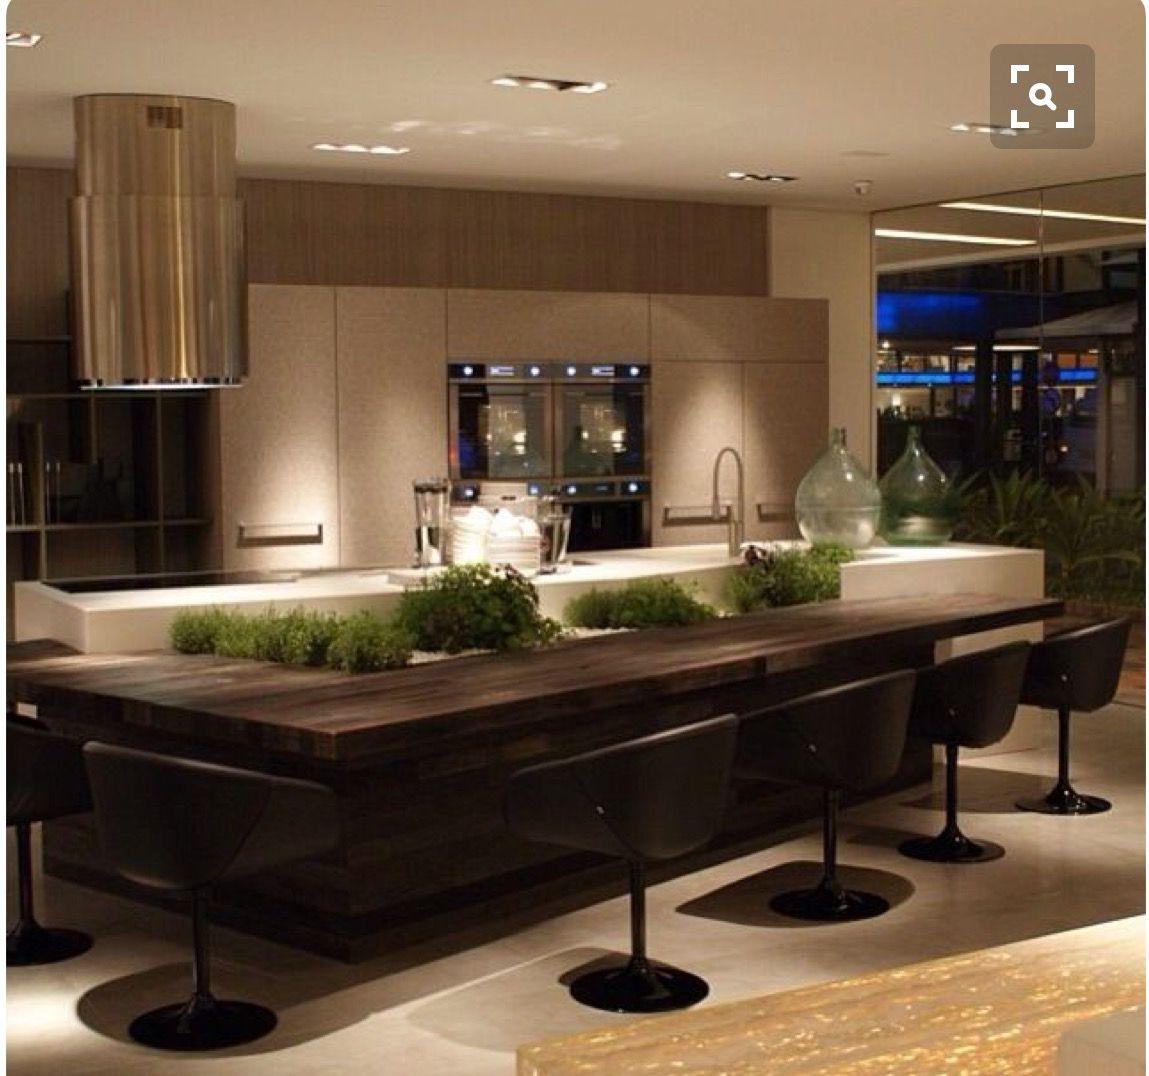 Kitchen Upstairs: Cozinhas Modernas